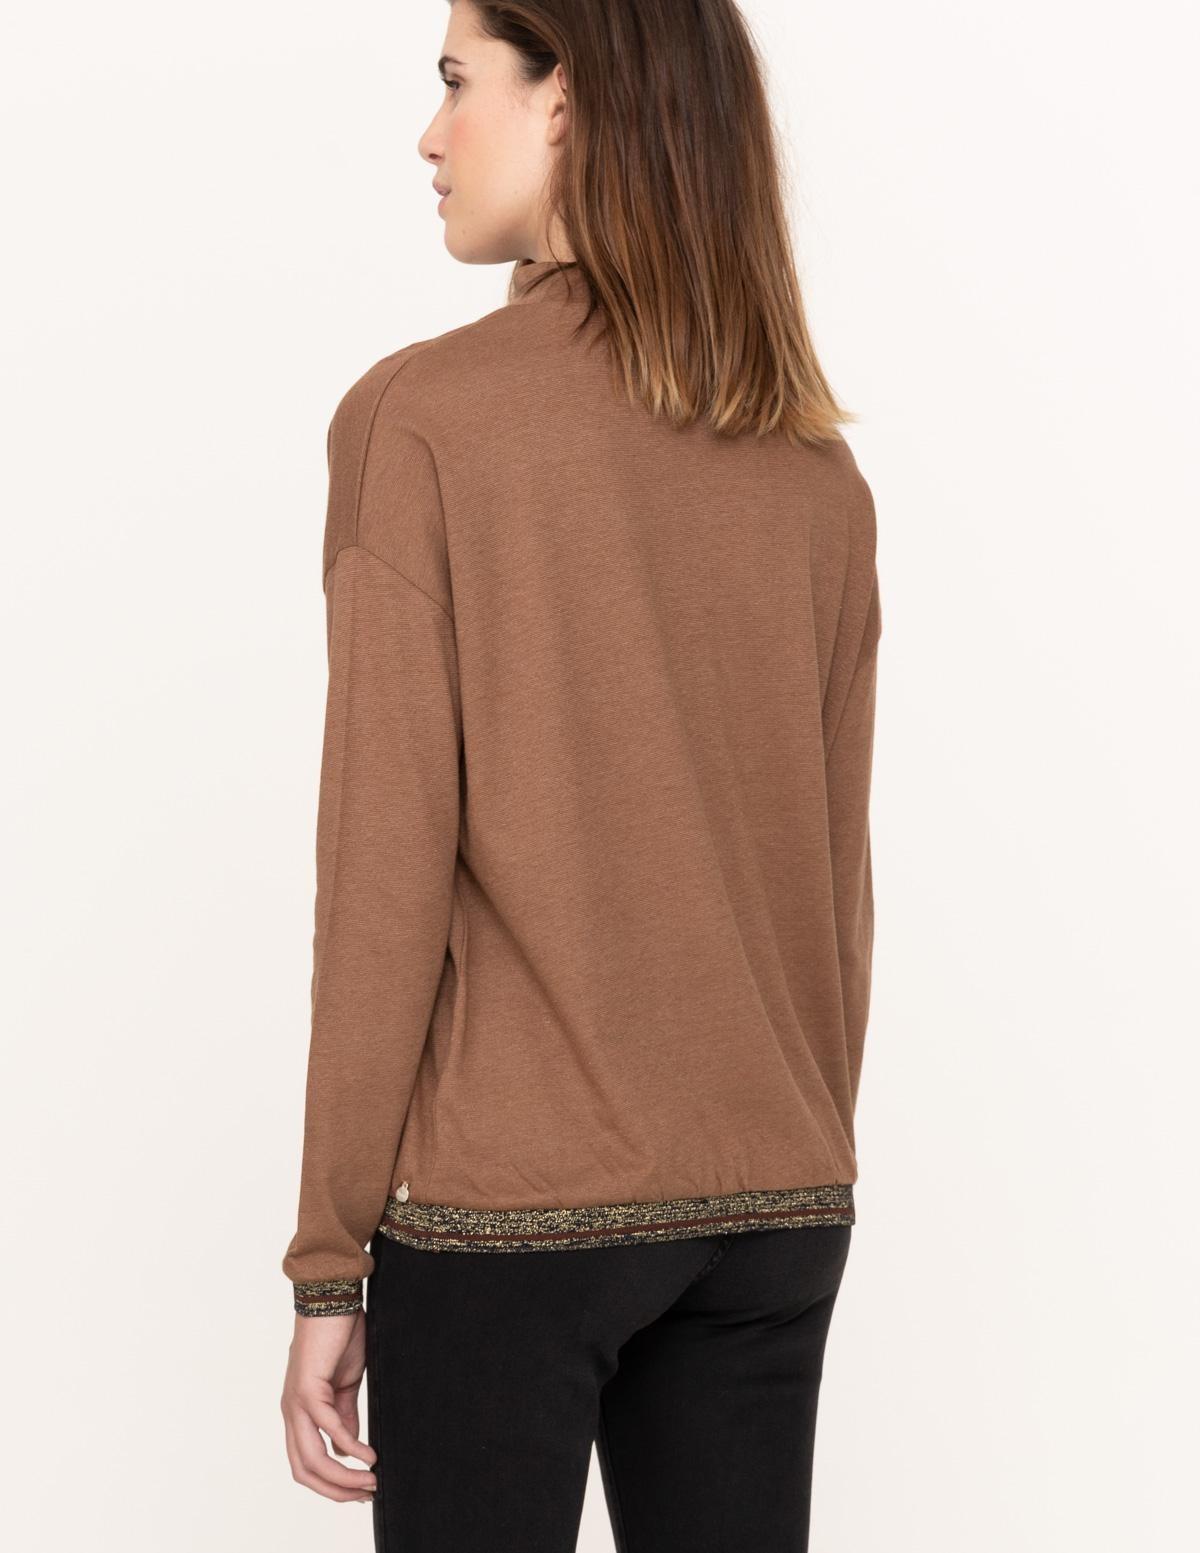 Camiseta detalles brillo - Ítem1